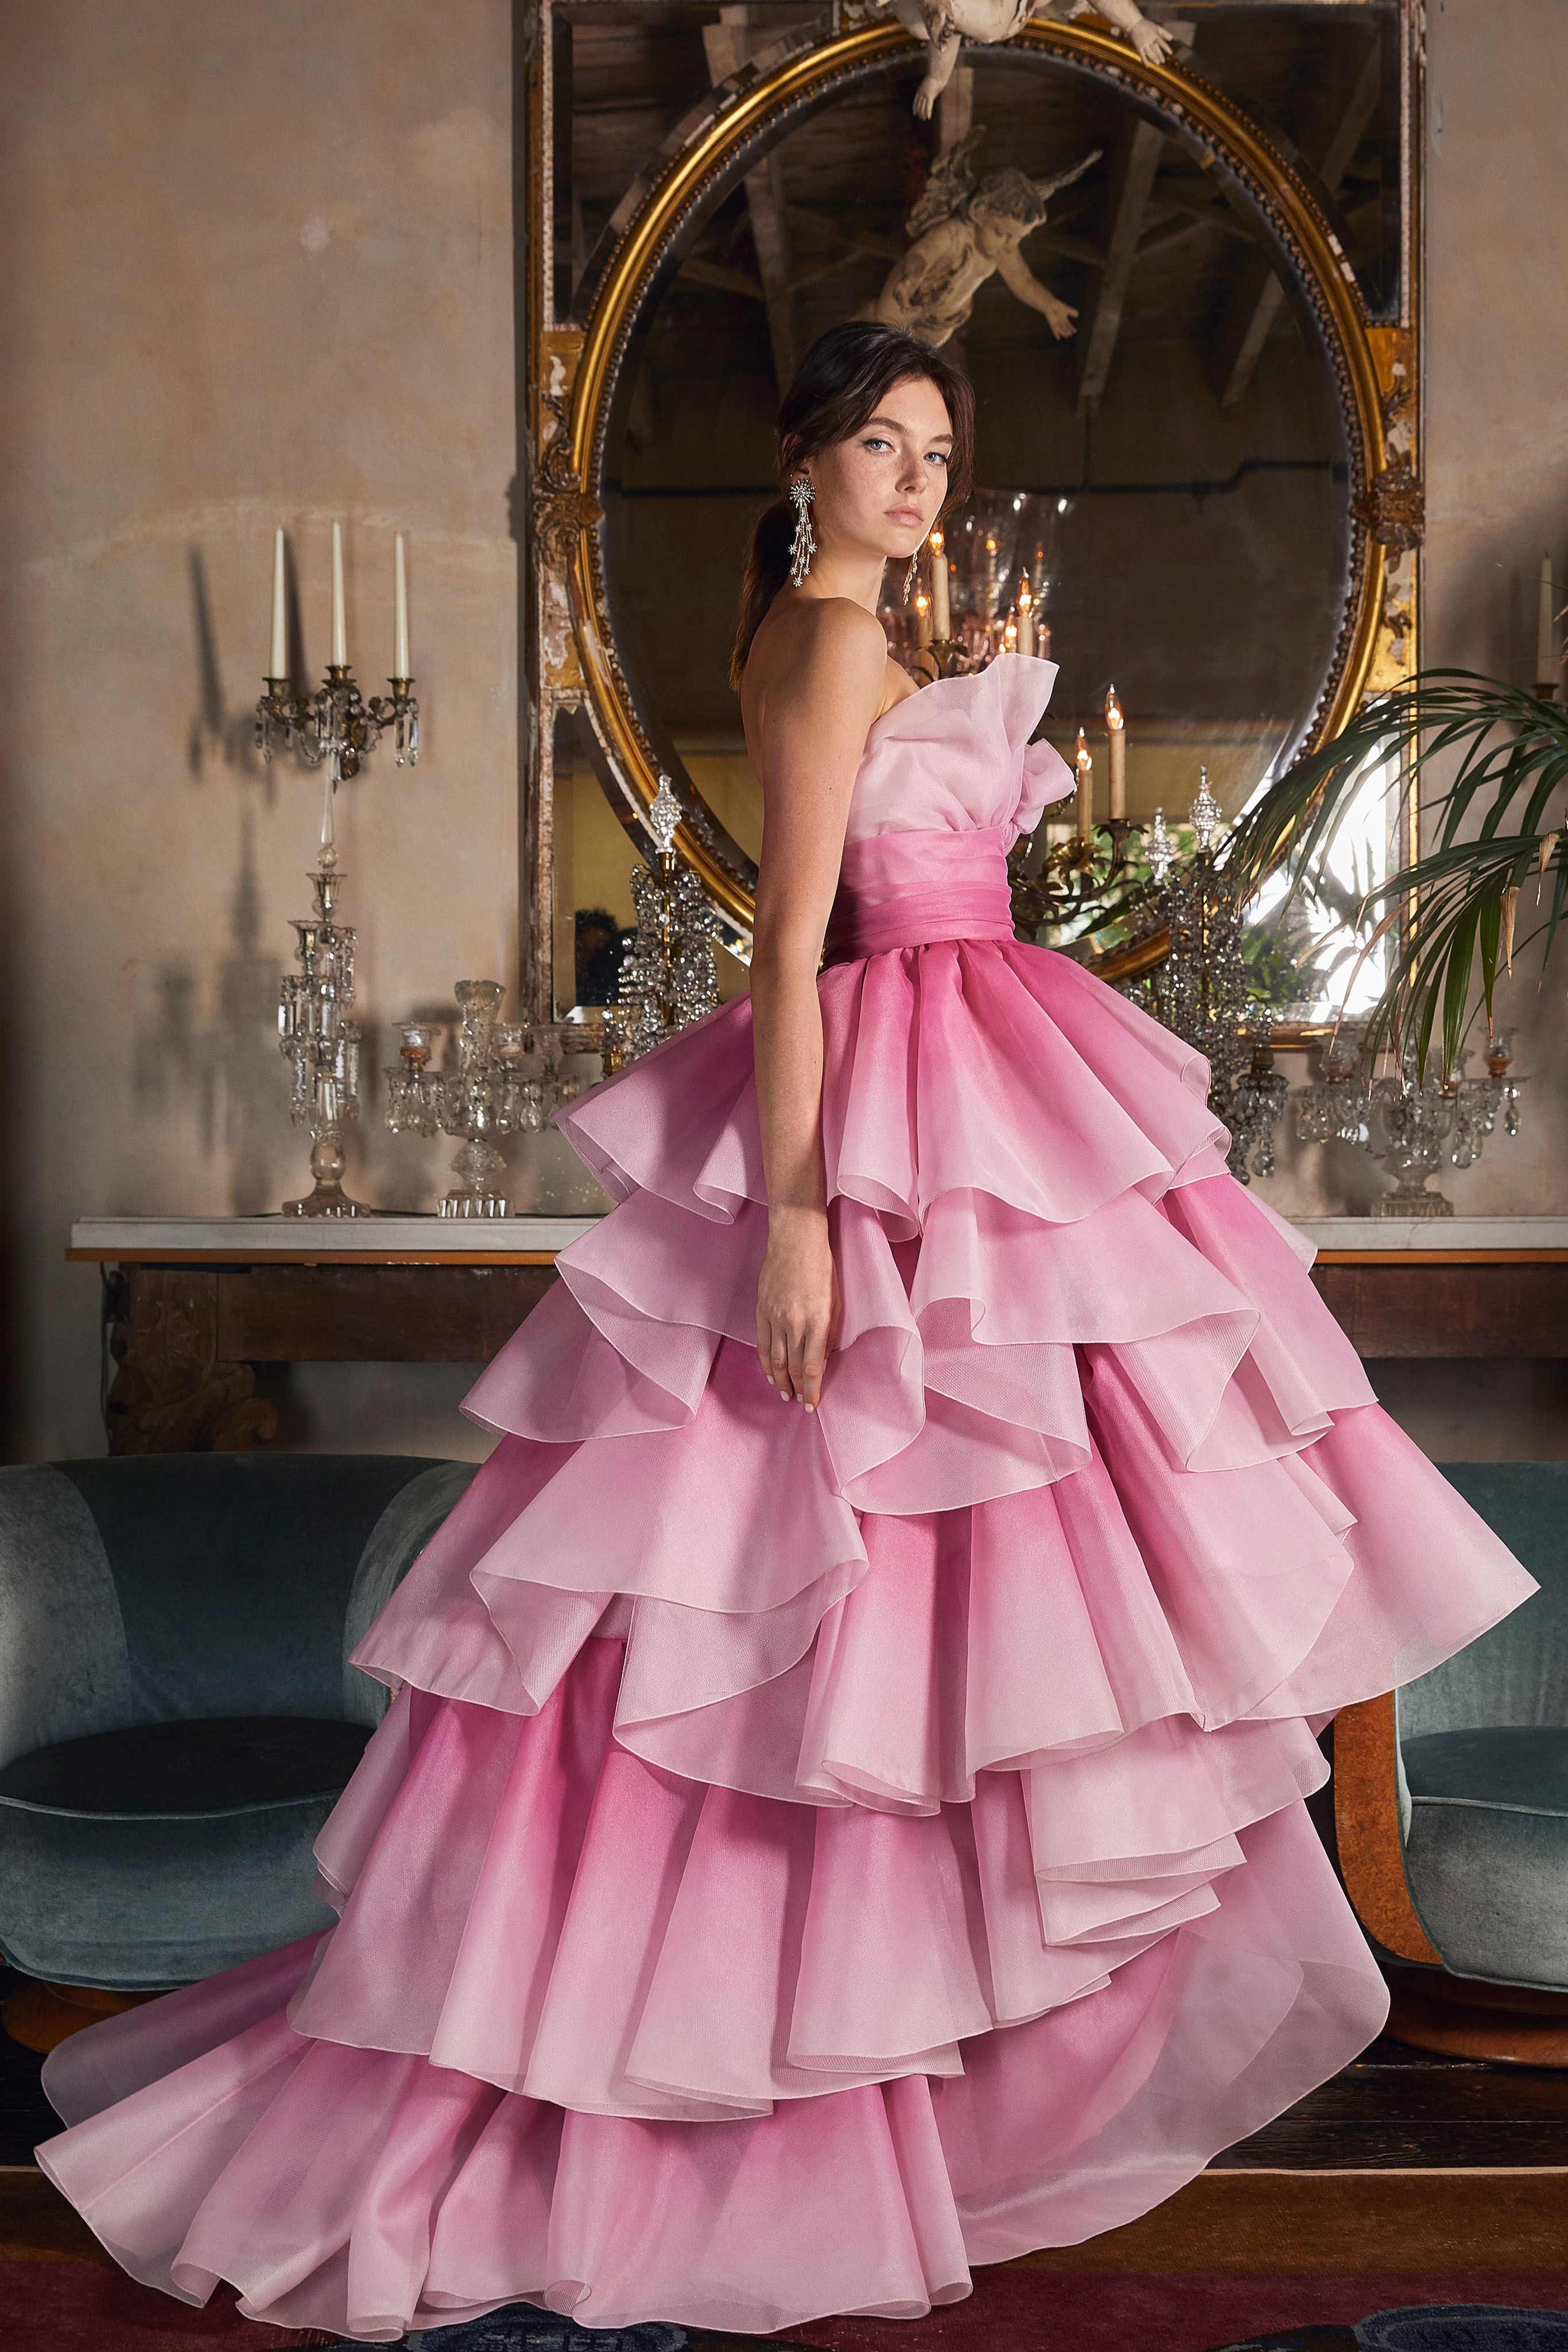 marchesa-notte-dresses-bridal-resort-2020-collection-evening-couture-gown-vogue